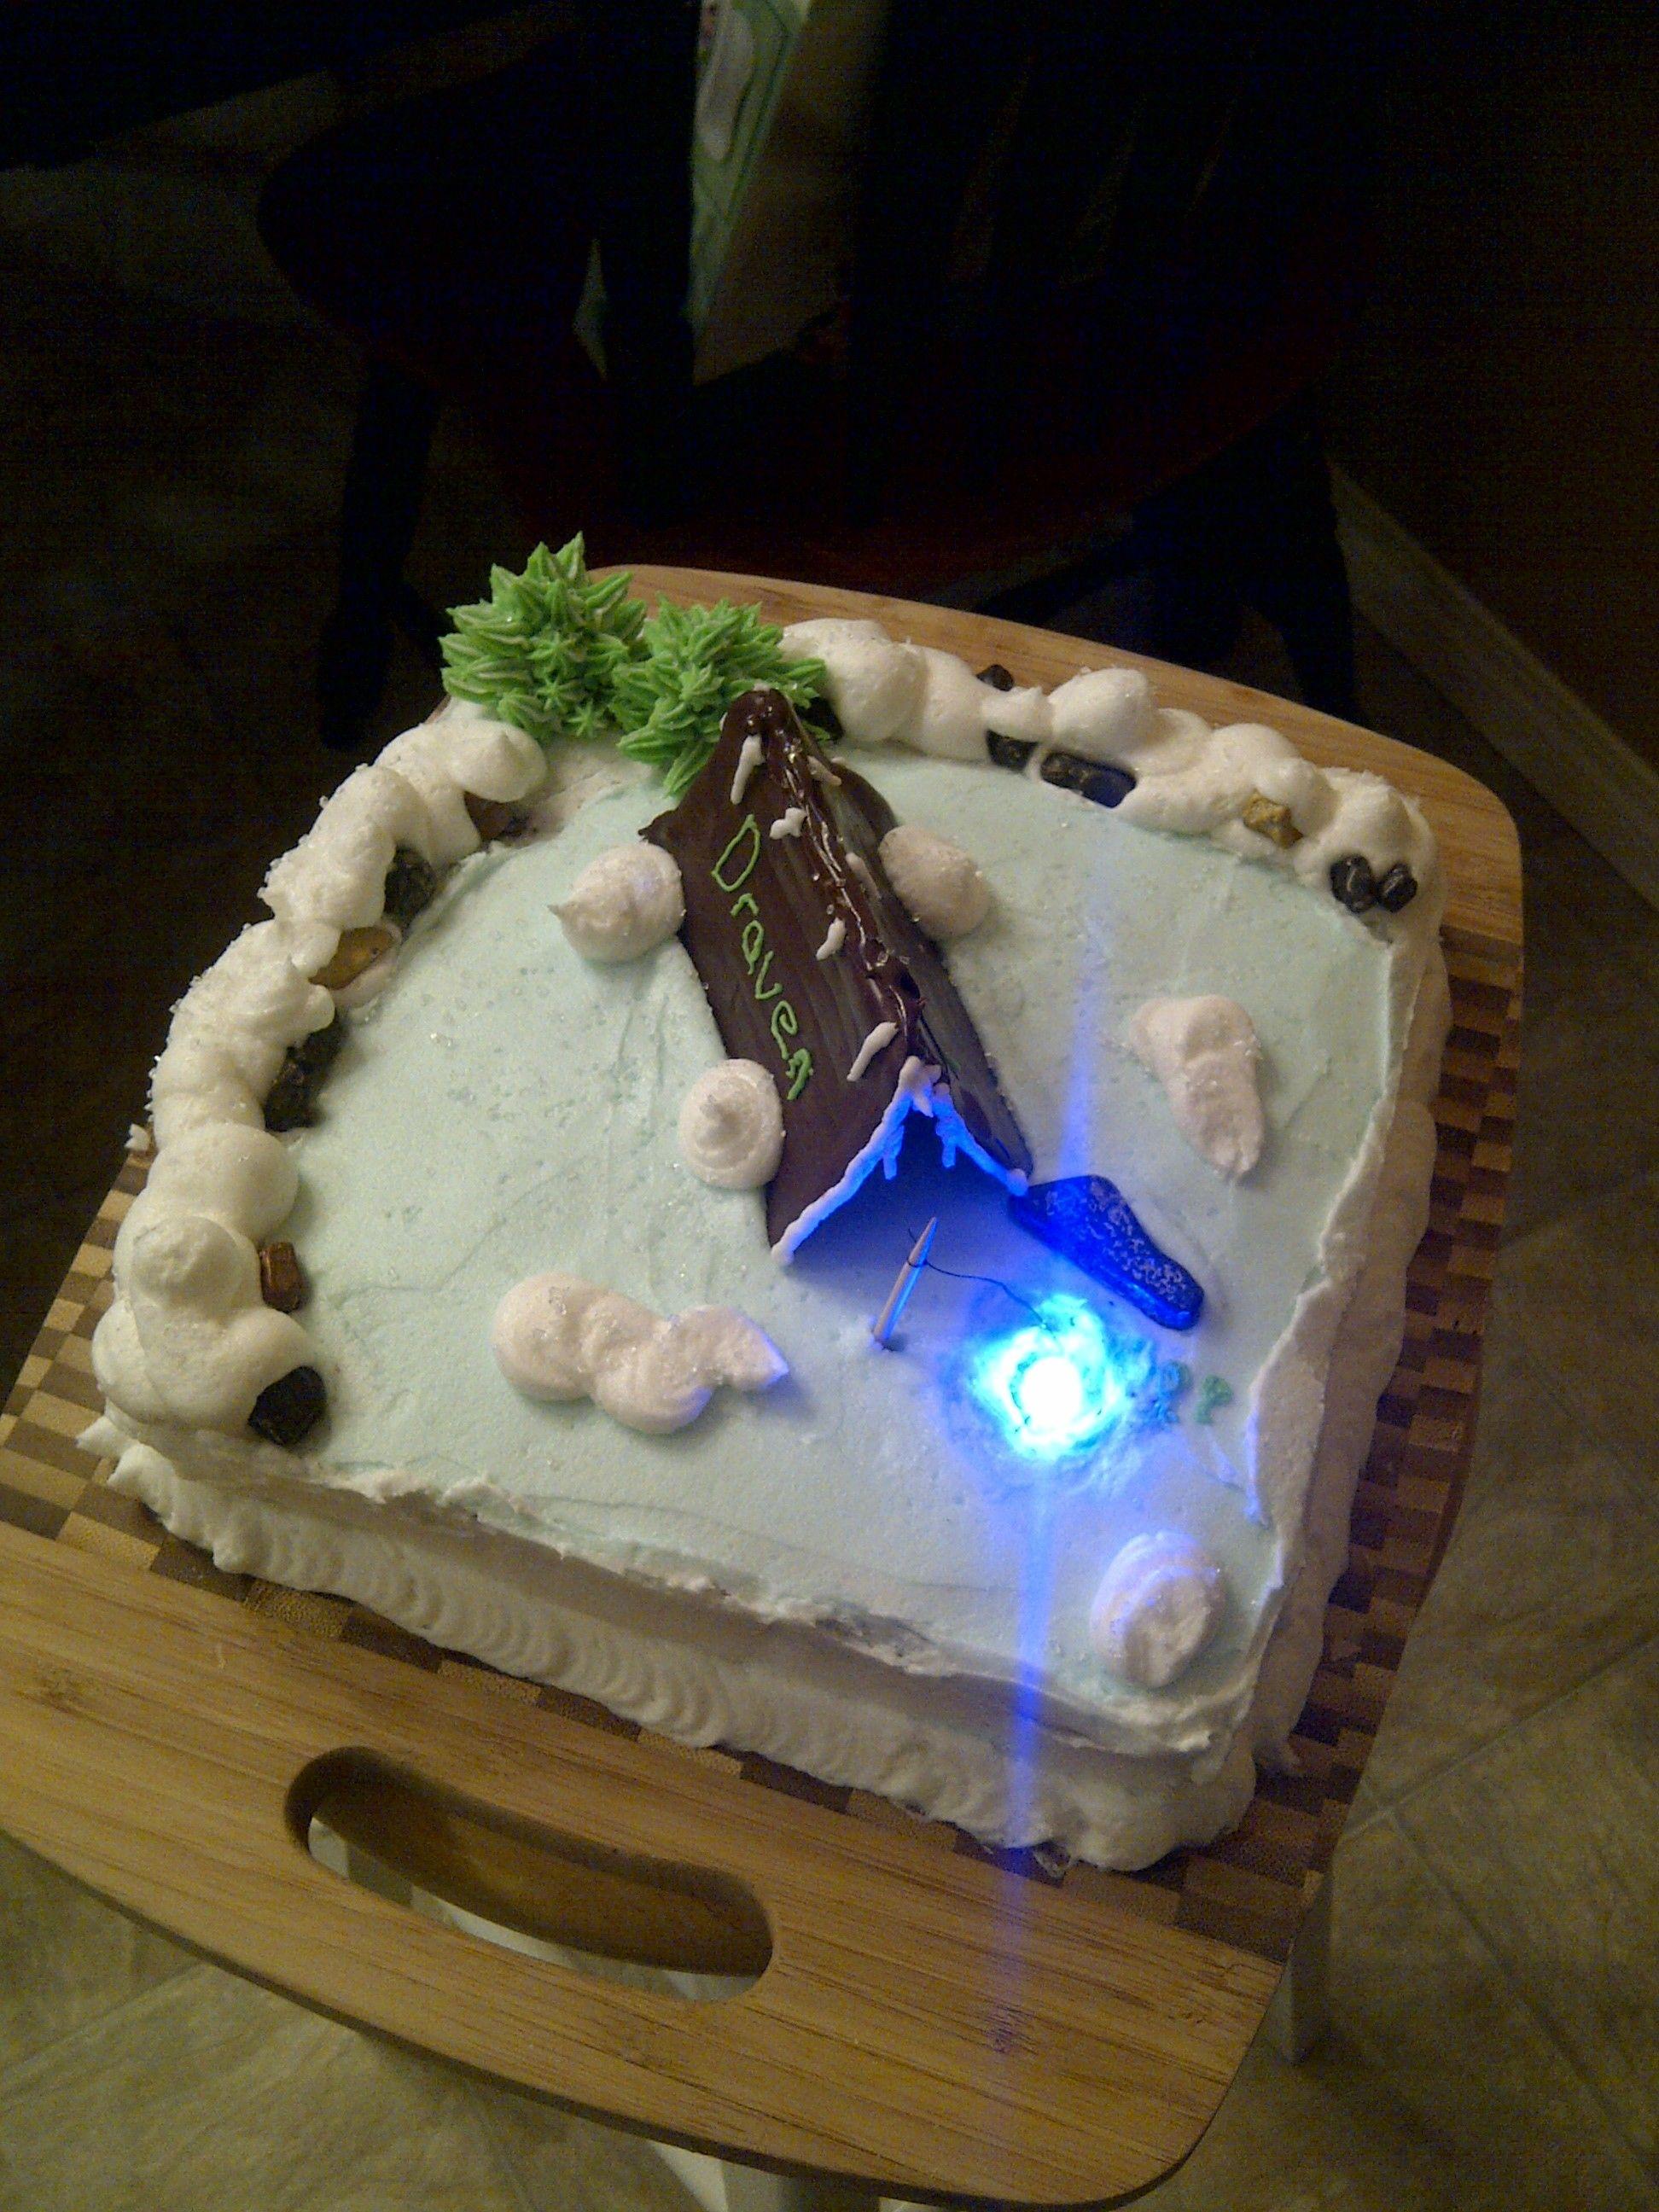 Cake Decorating Service